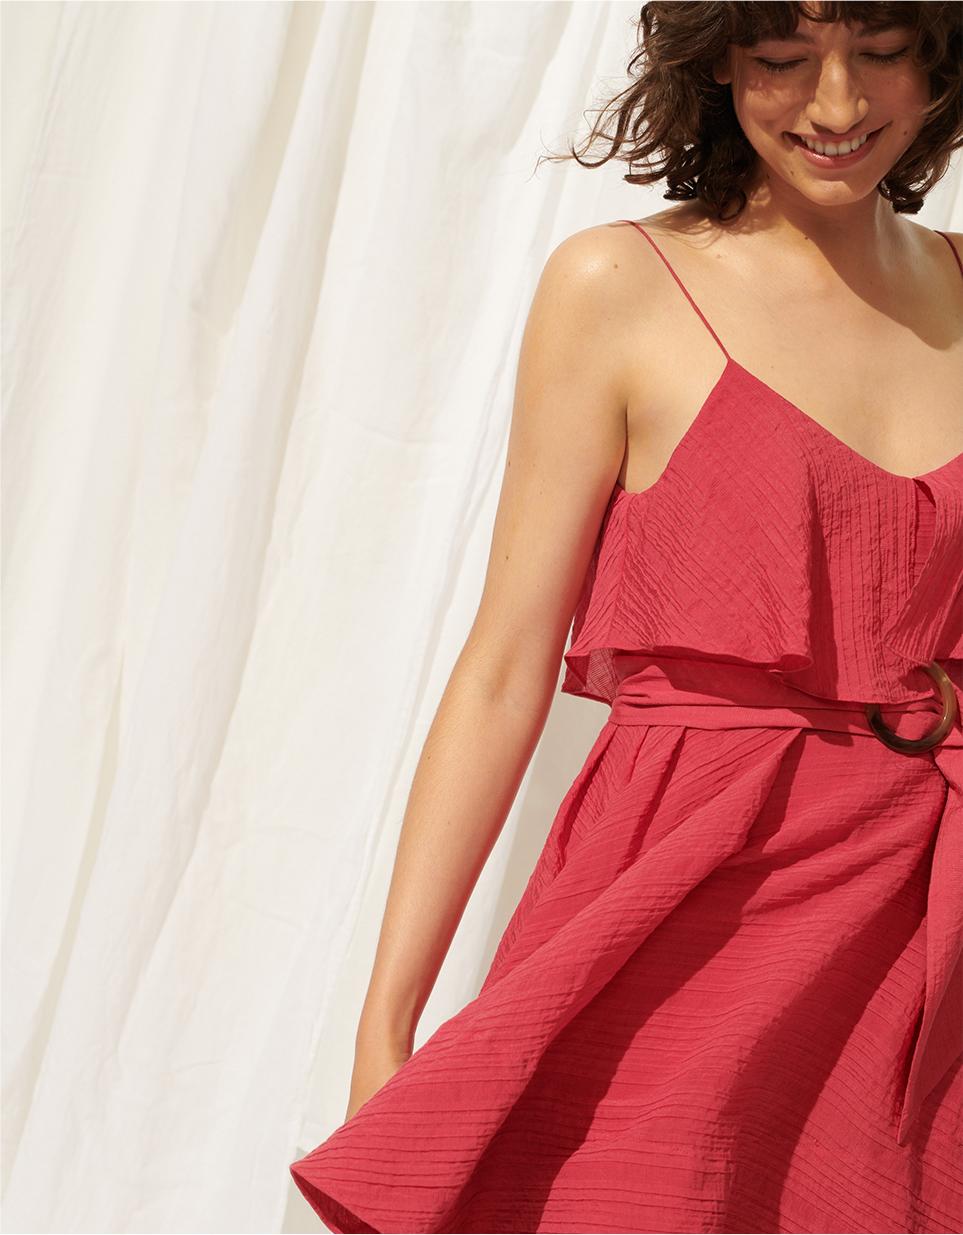 a10de492e14 Club Monaco: Designer Men's & Women's Clothing